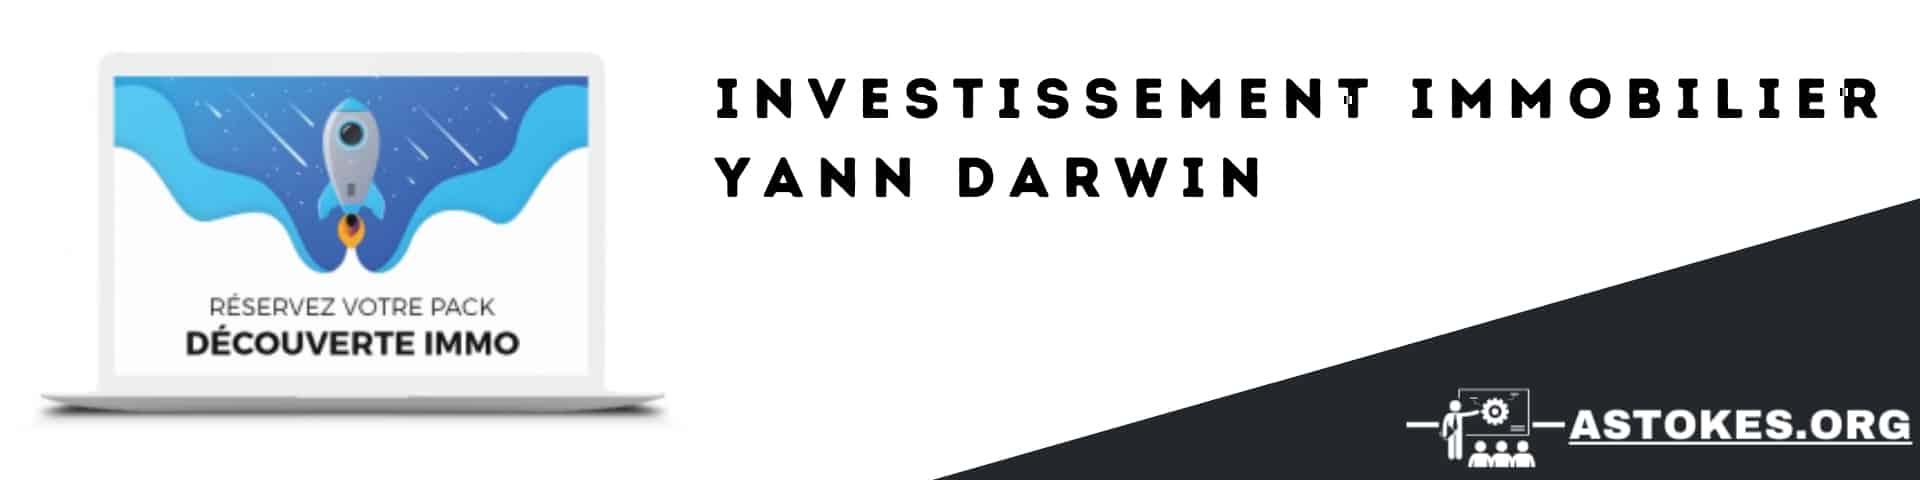 investissement immobilier yann darwin